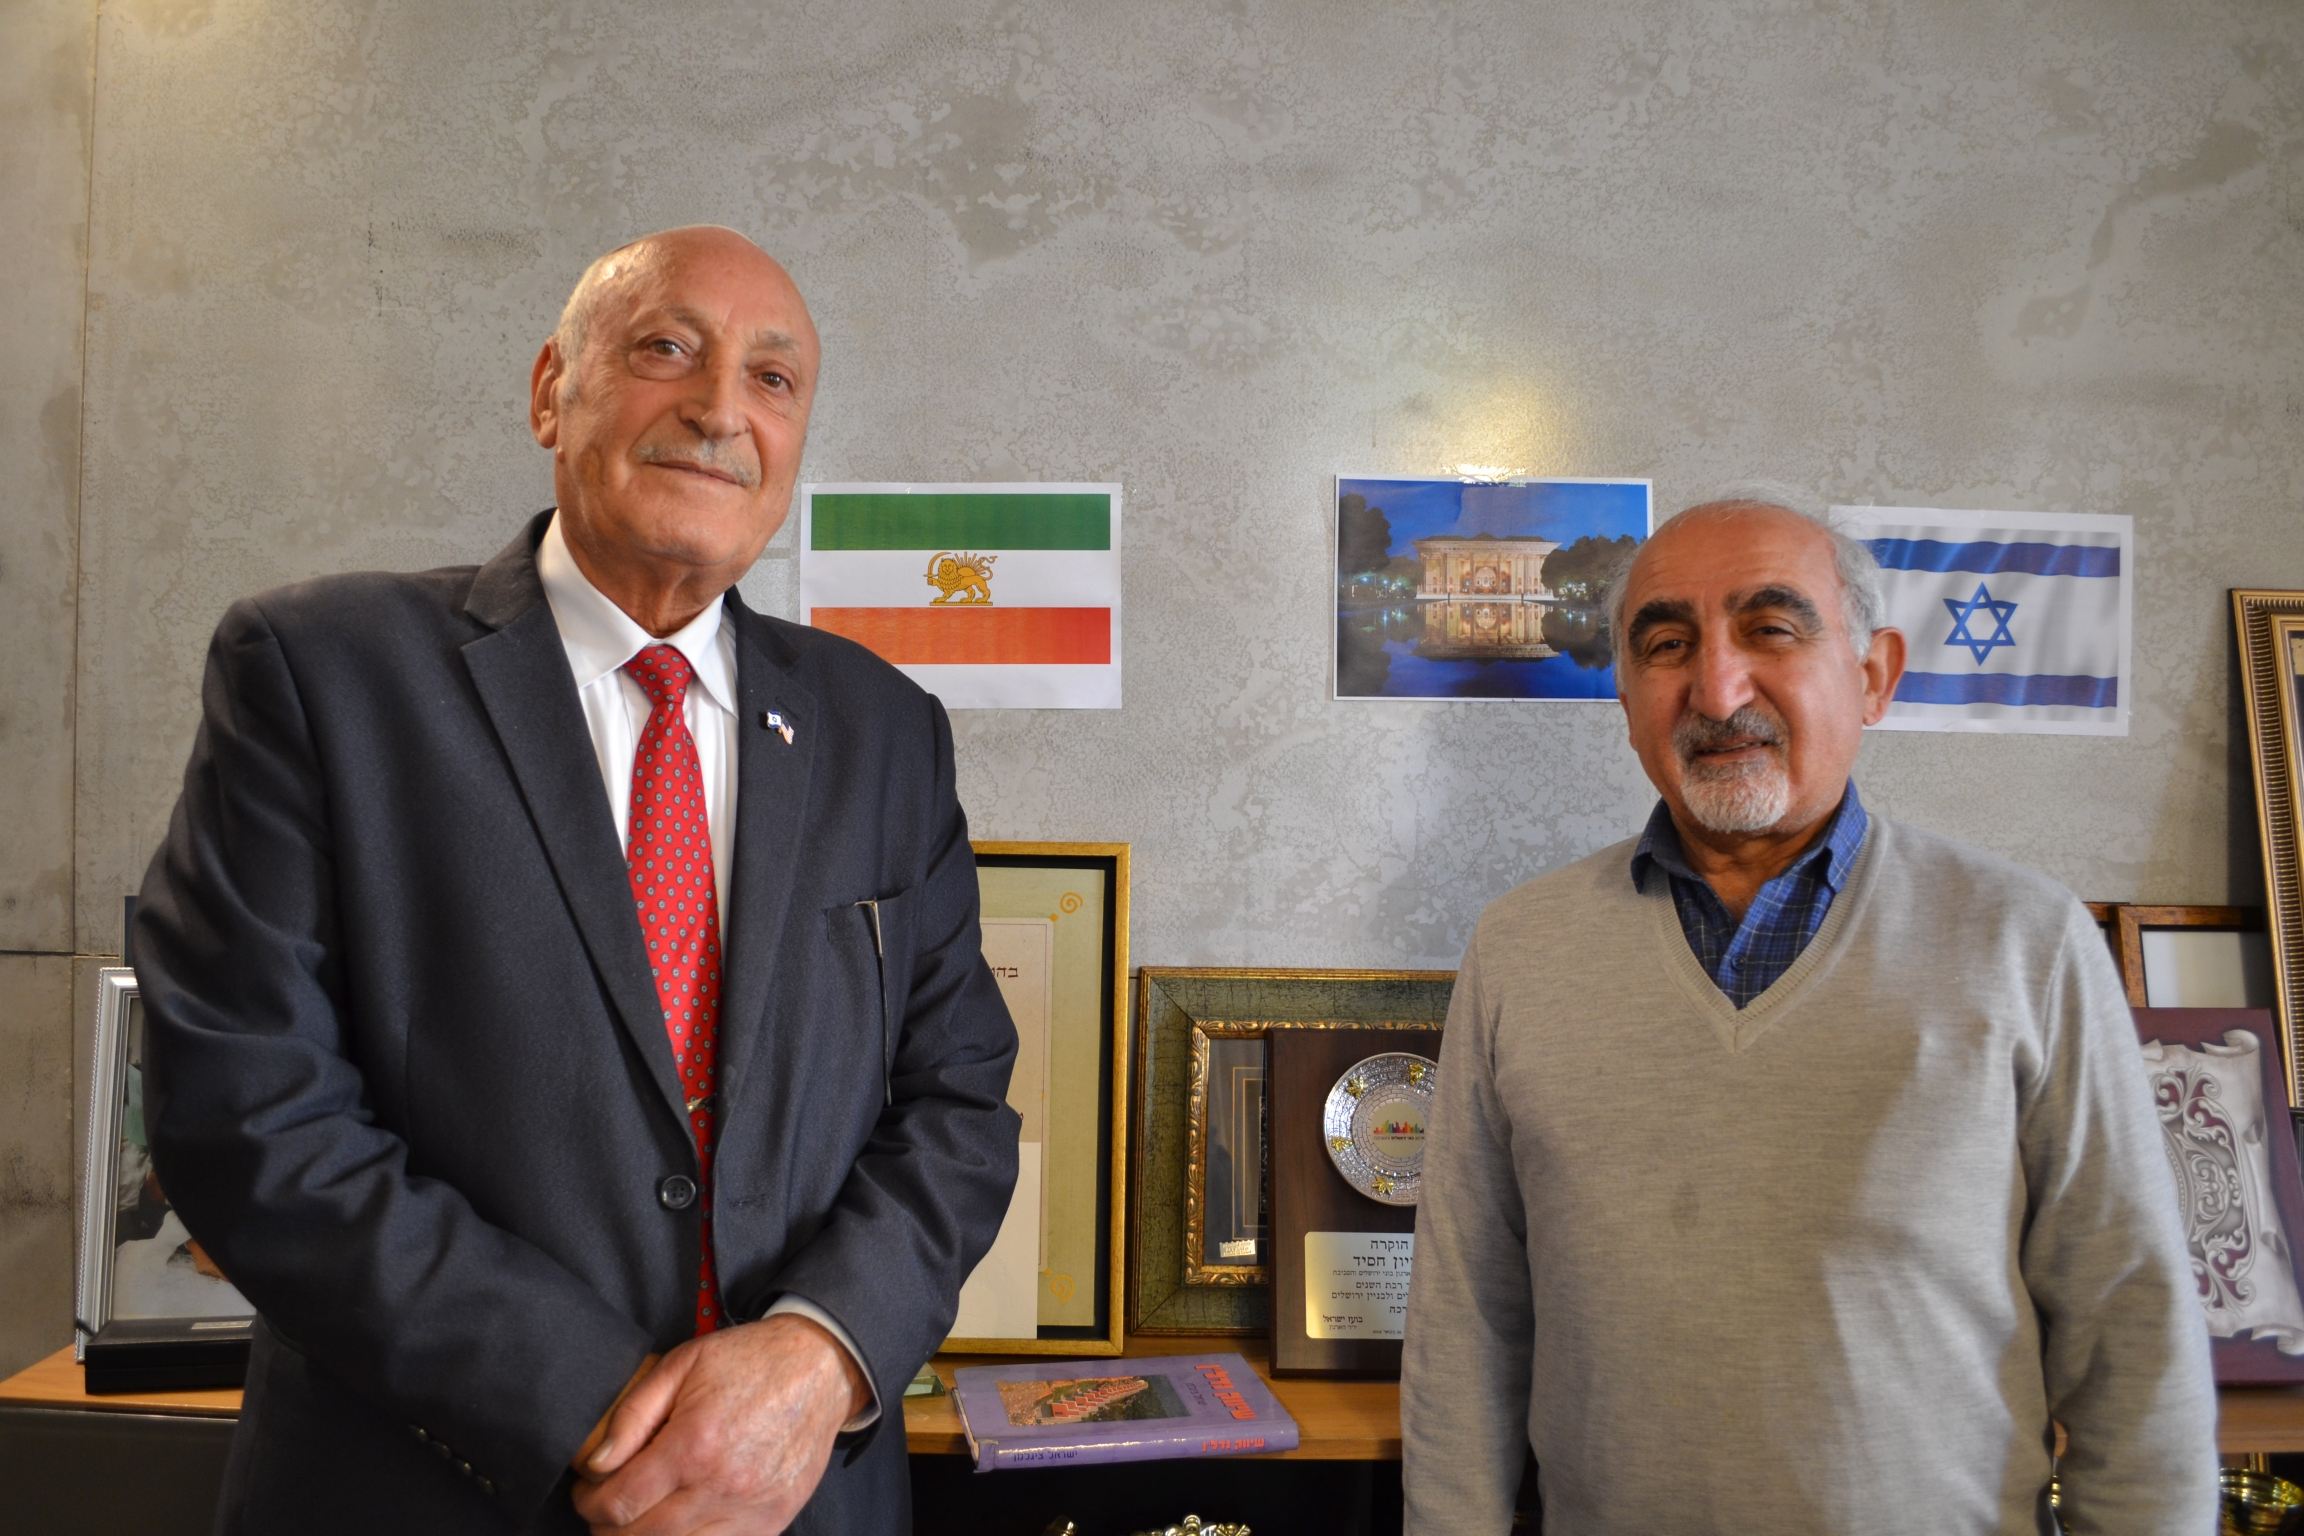 Zion Hasid and Iraj Aghajani run an organization for Iranian immigrants to Israel.